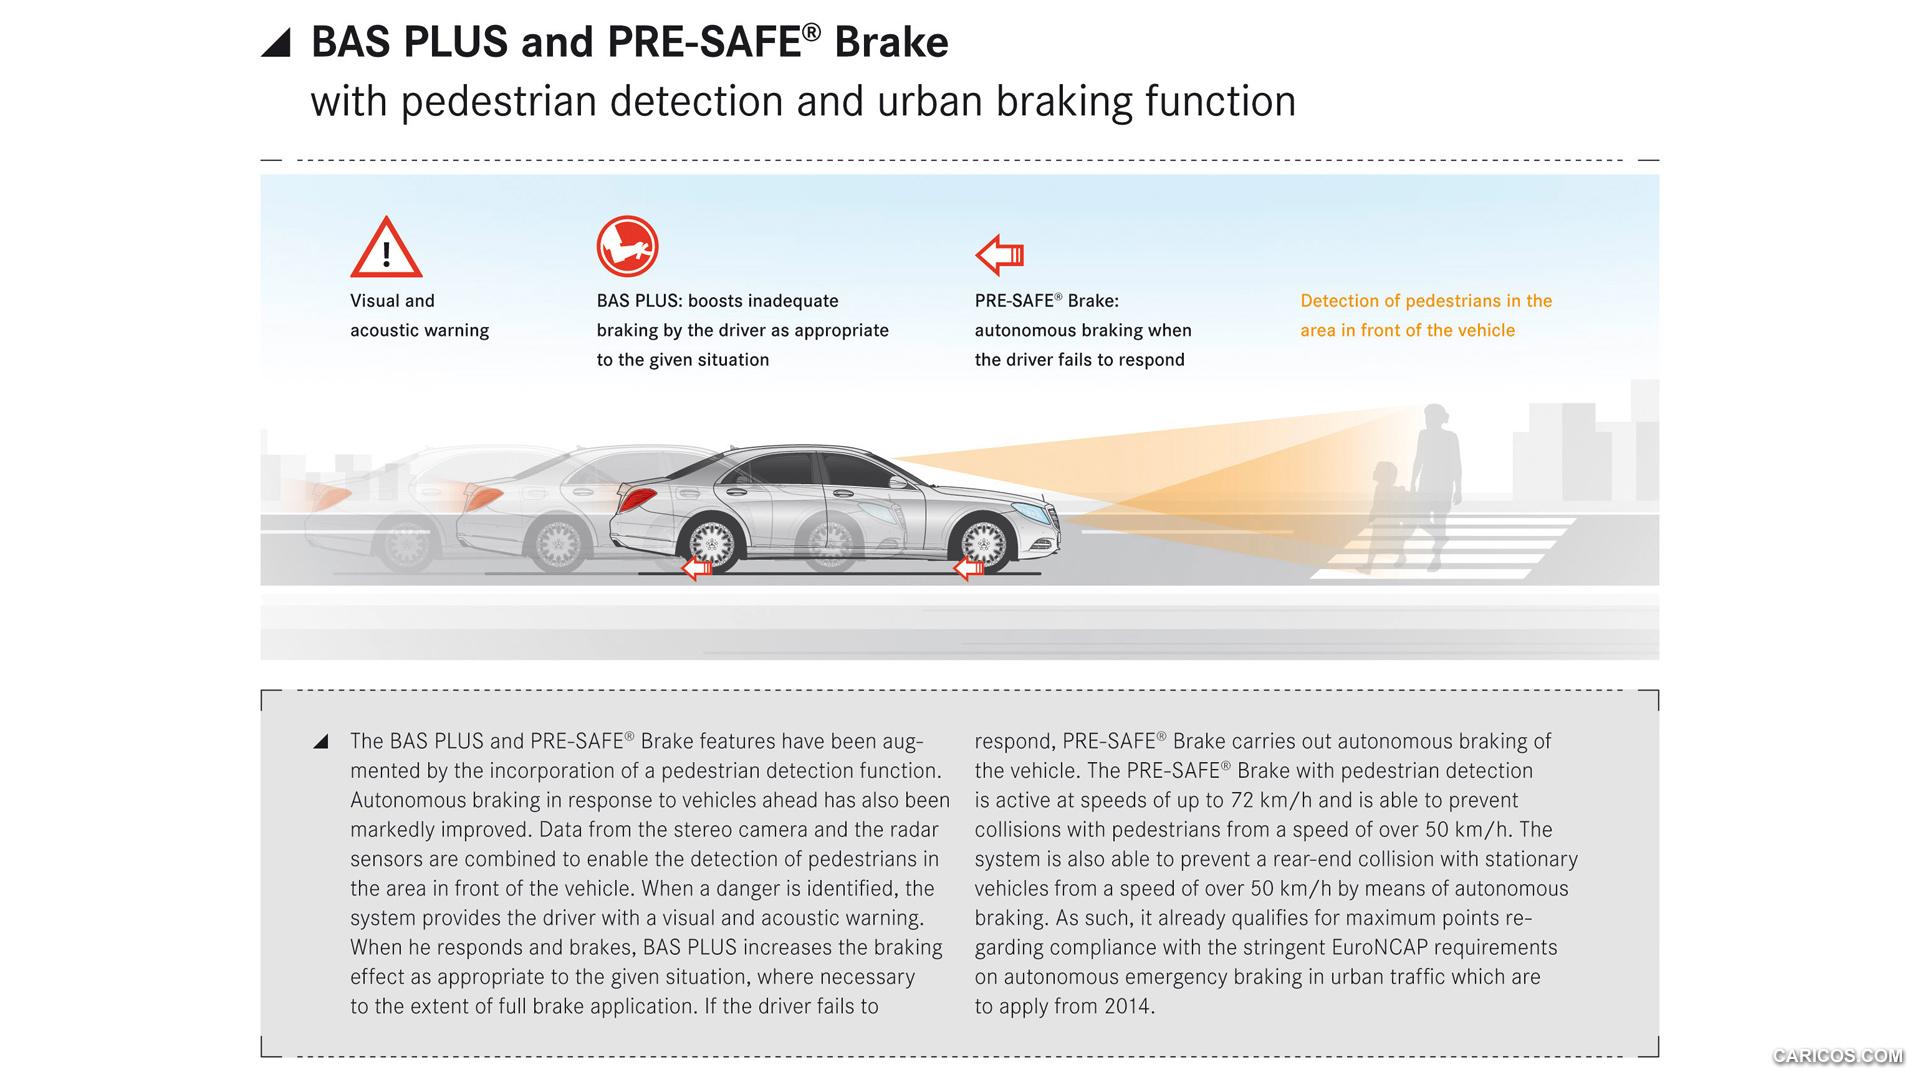 2014 Mercedes Benz S Class BAS Plus and PRE Safe Brake    HD Wallpaper